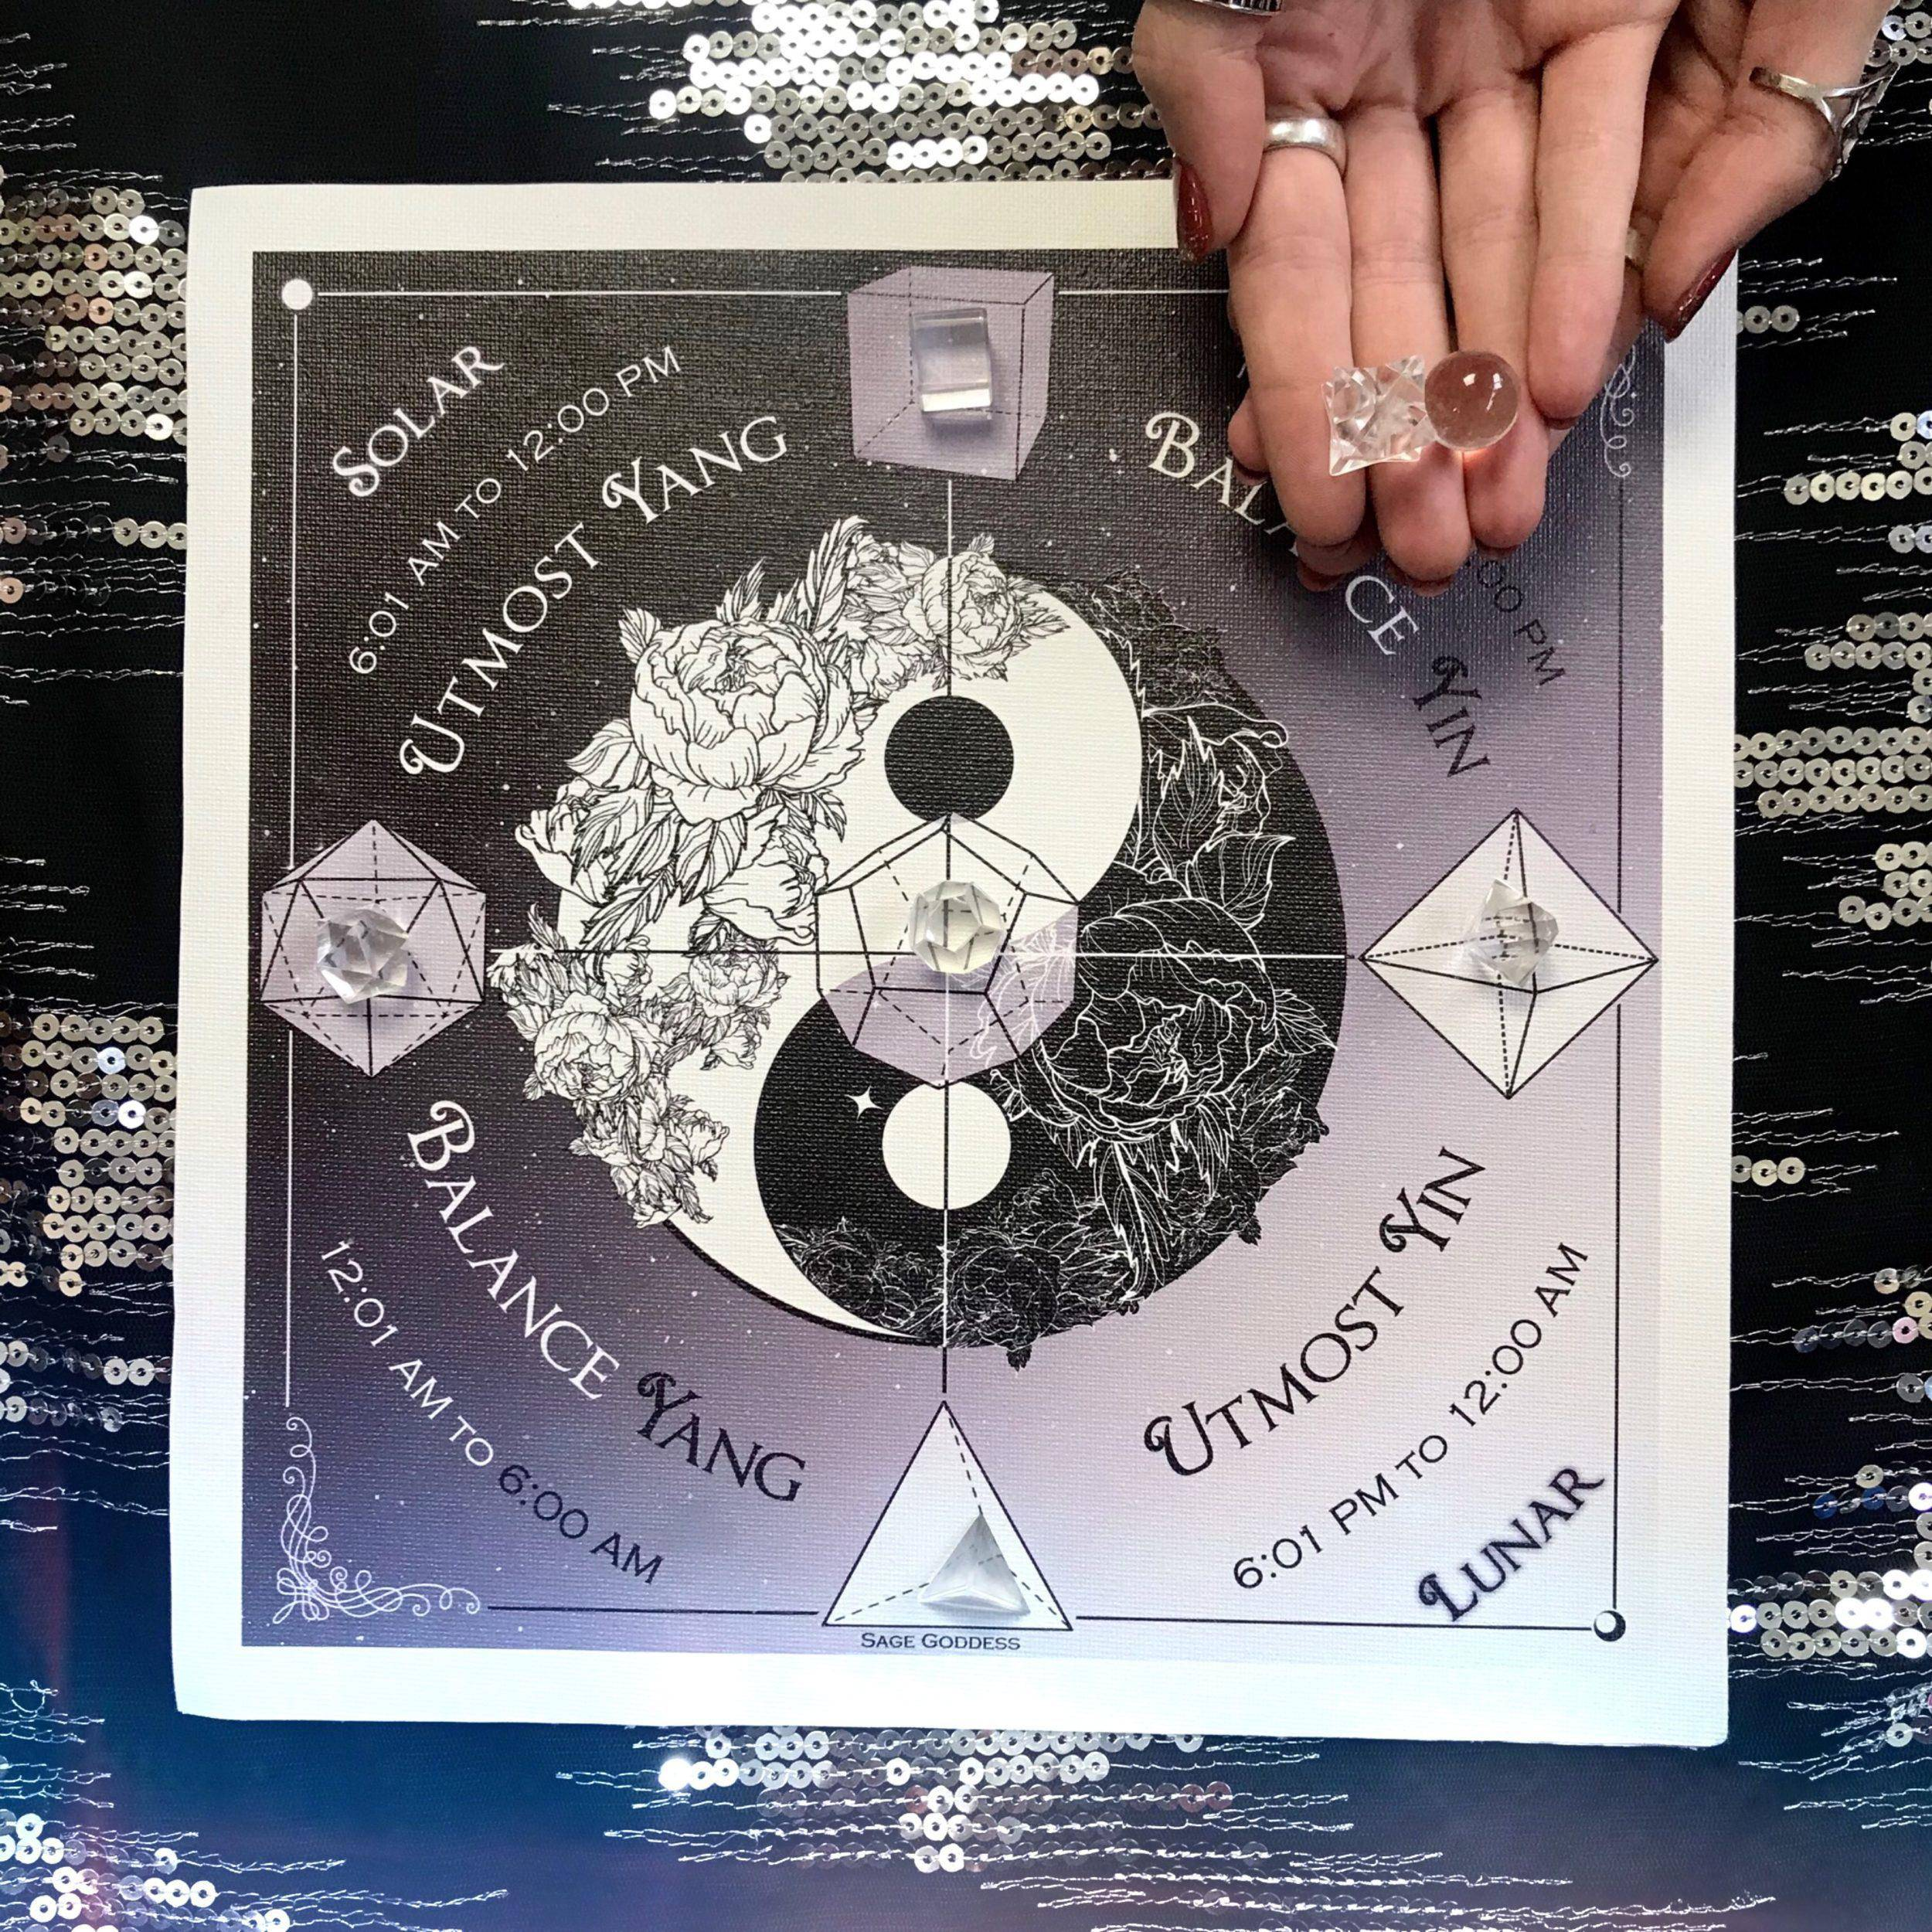 OLAS_Yin_Yang_Birth_Time_Set_bonus_class_4OF6_9_29